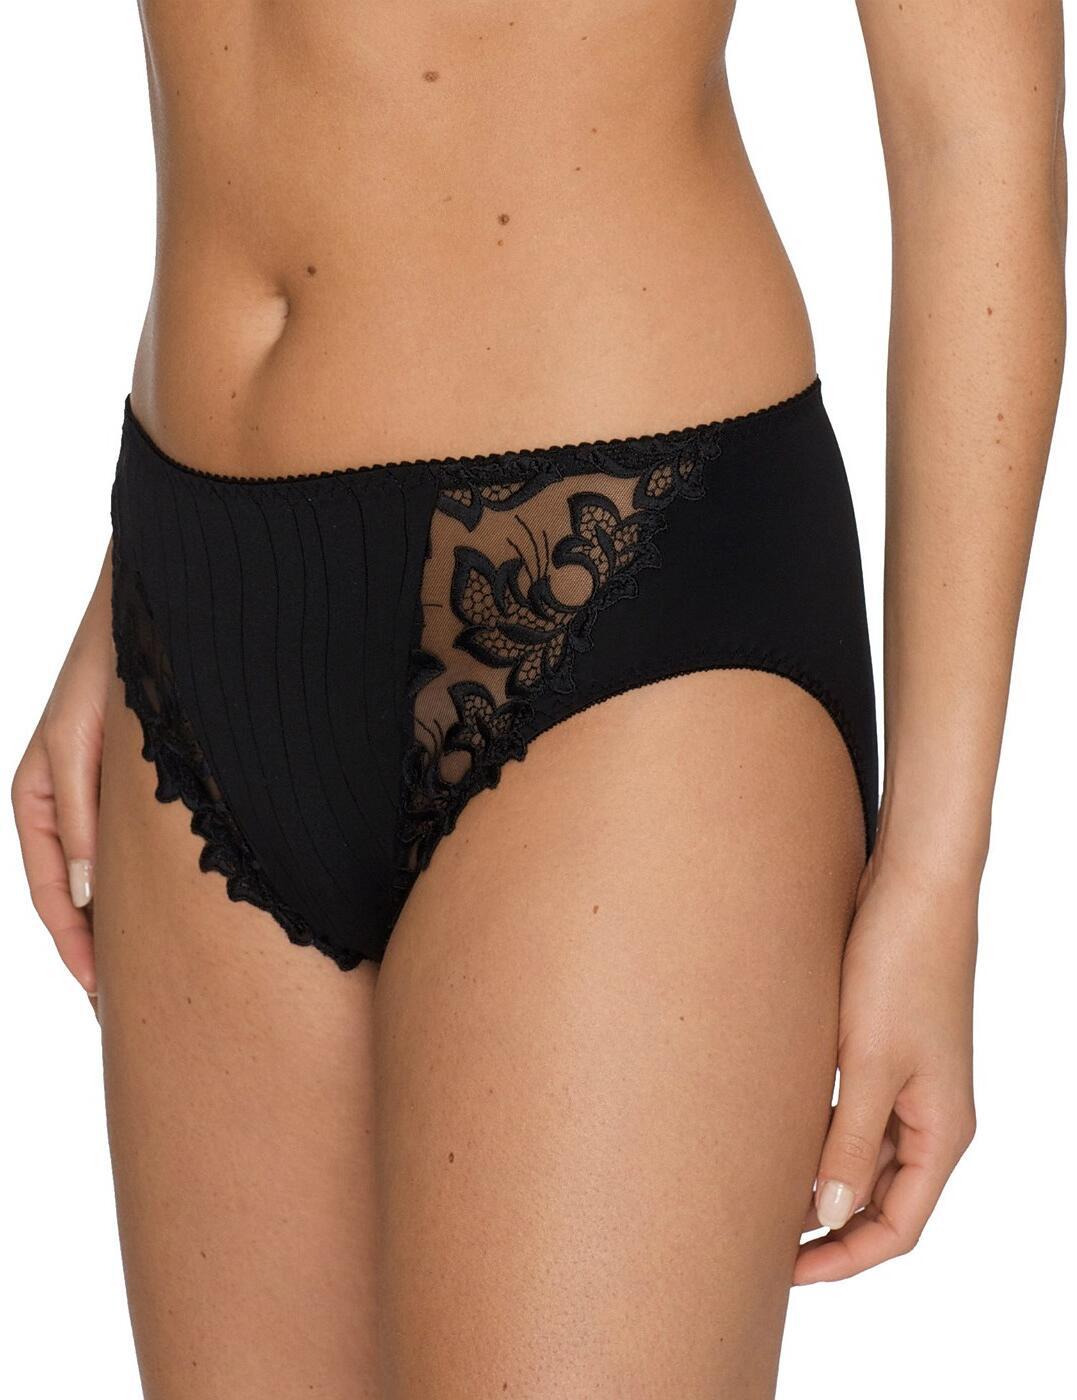 Prima-Donna-Deauville-Volle-Unterhose-Slip-Slips-Pant-0561811-Luxus-Dessous Indexbild 13